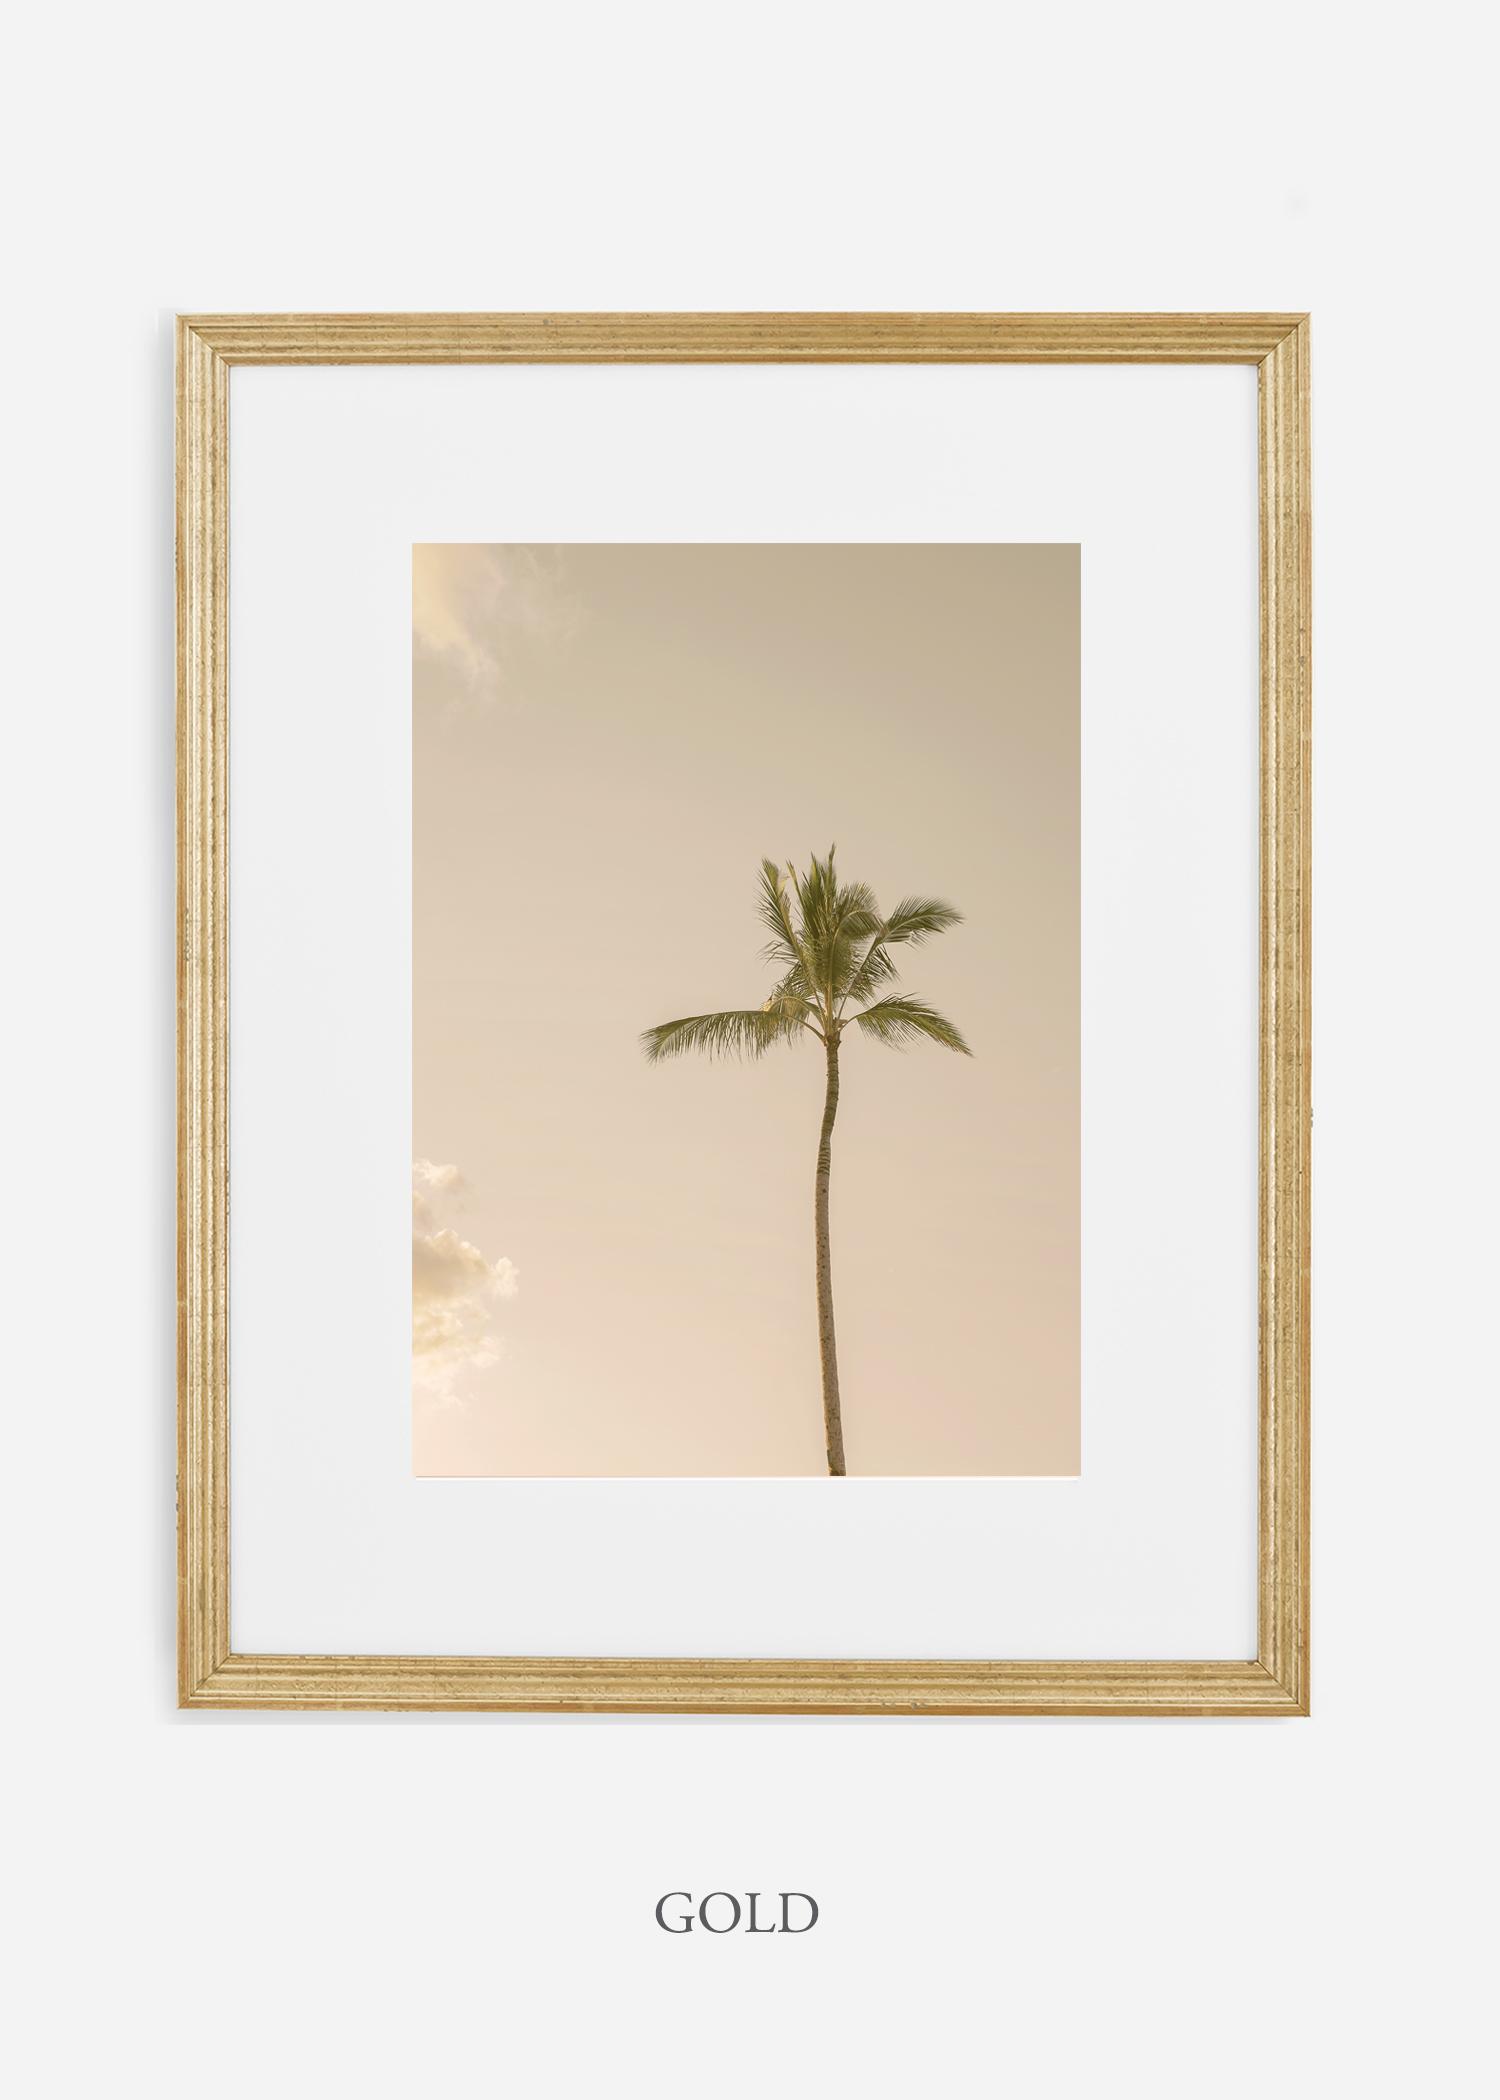 WilderCalifornia_Hawaii_lonepalm_tropicalart_goldframe.jpg